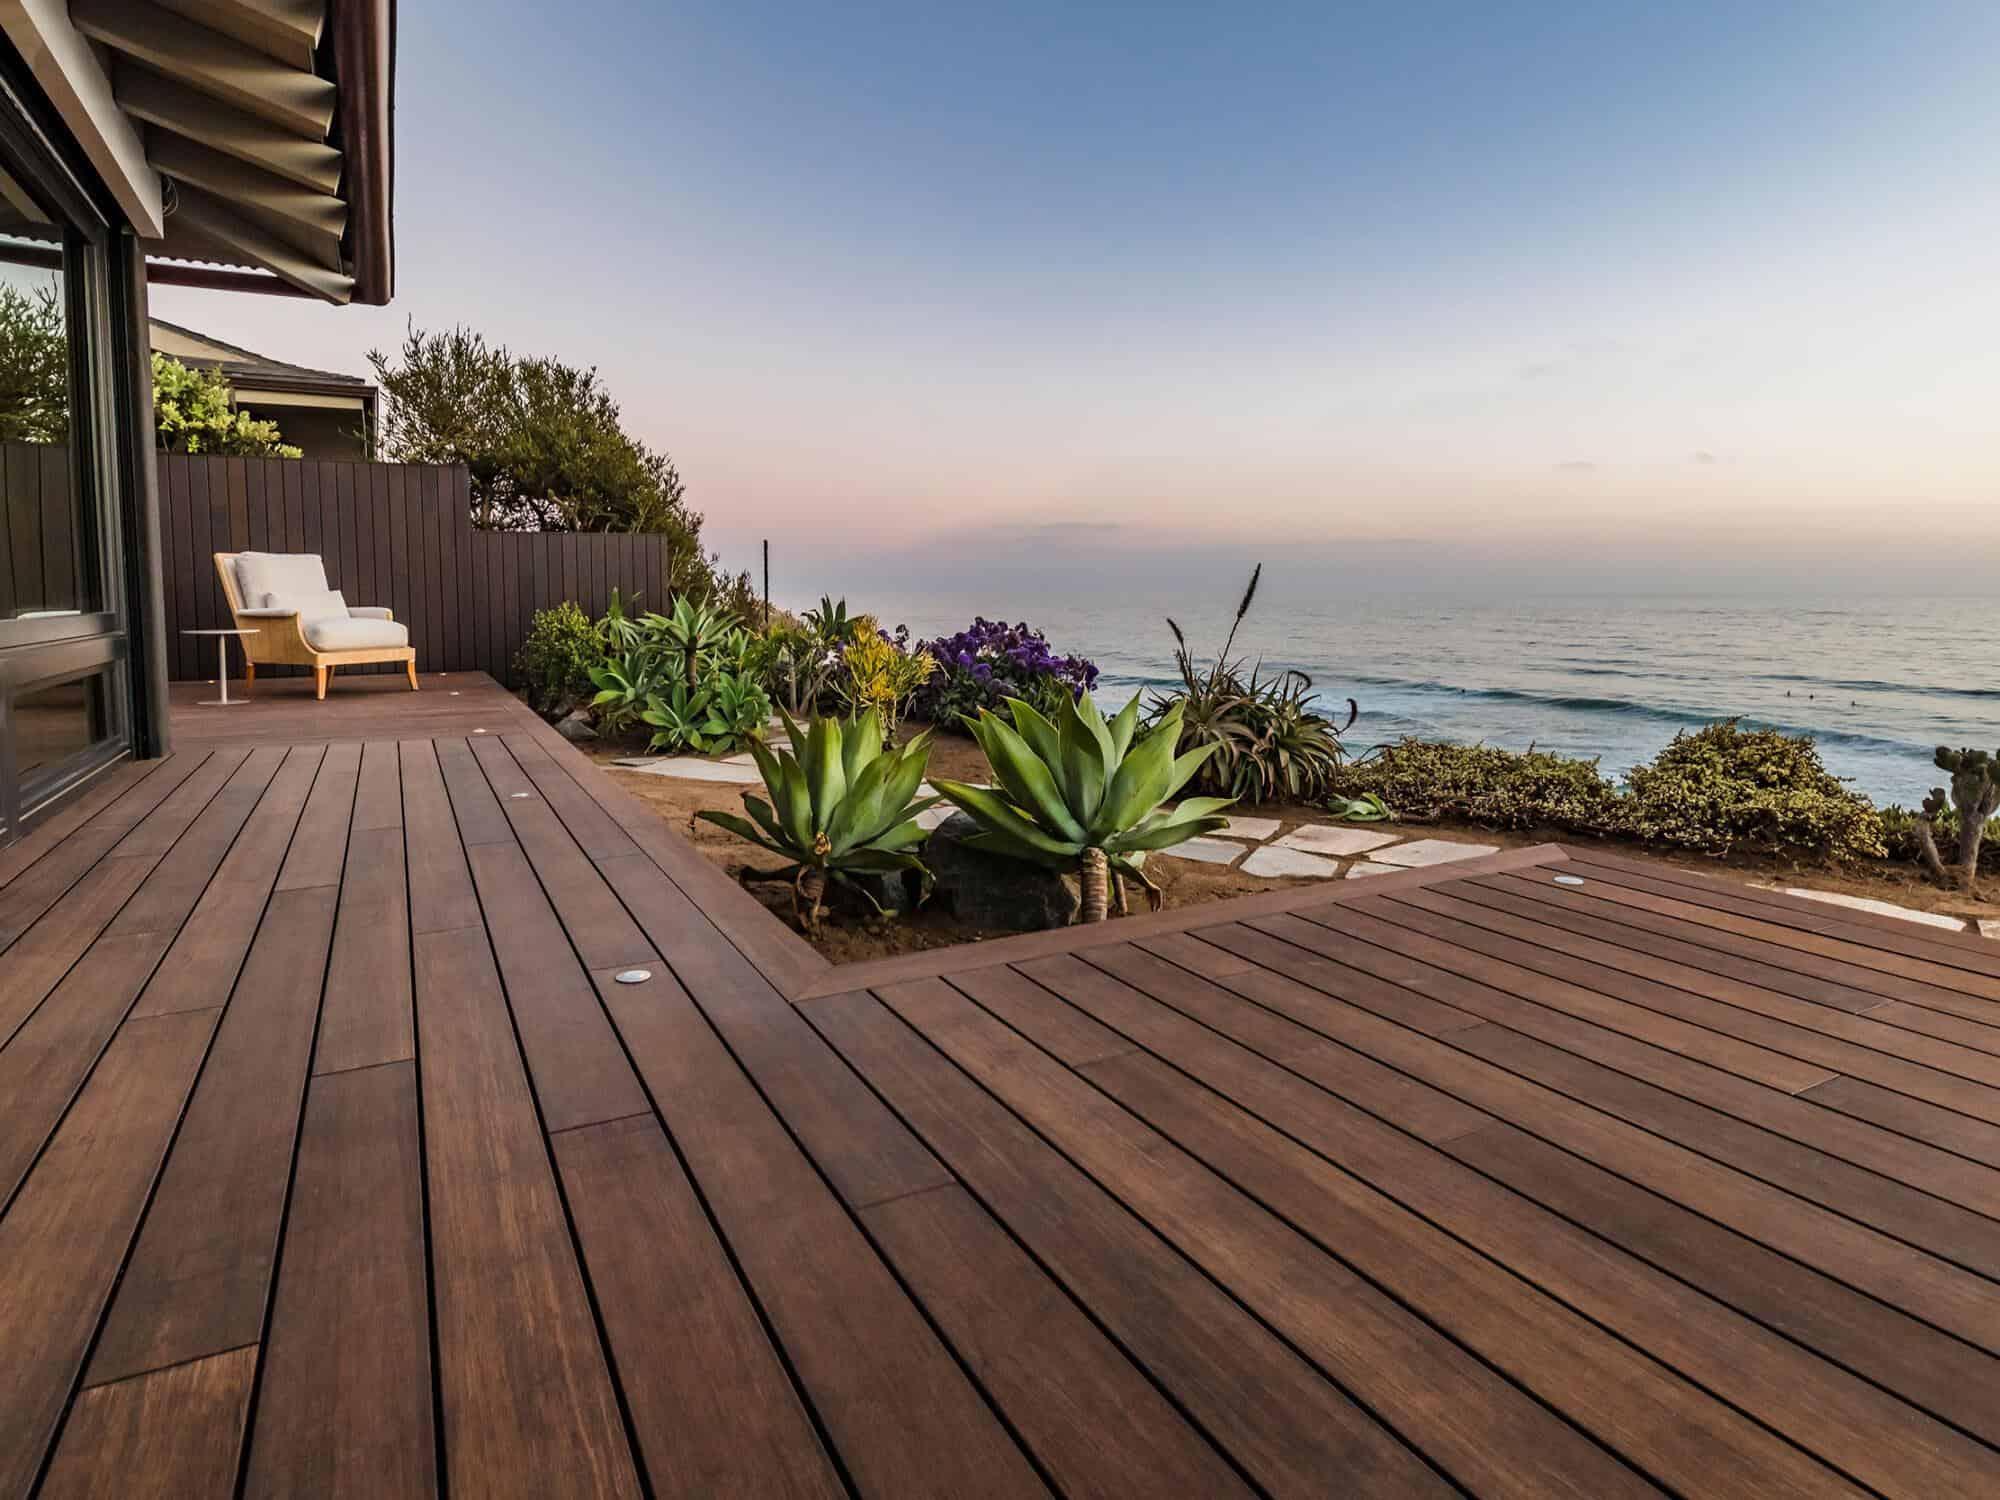 terasos lentos terasinės lentos terasines lentos bambukines terasos lentos bambuko terasos lentos